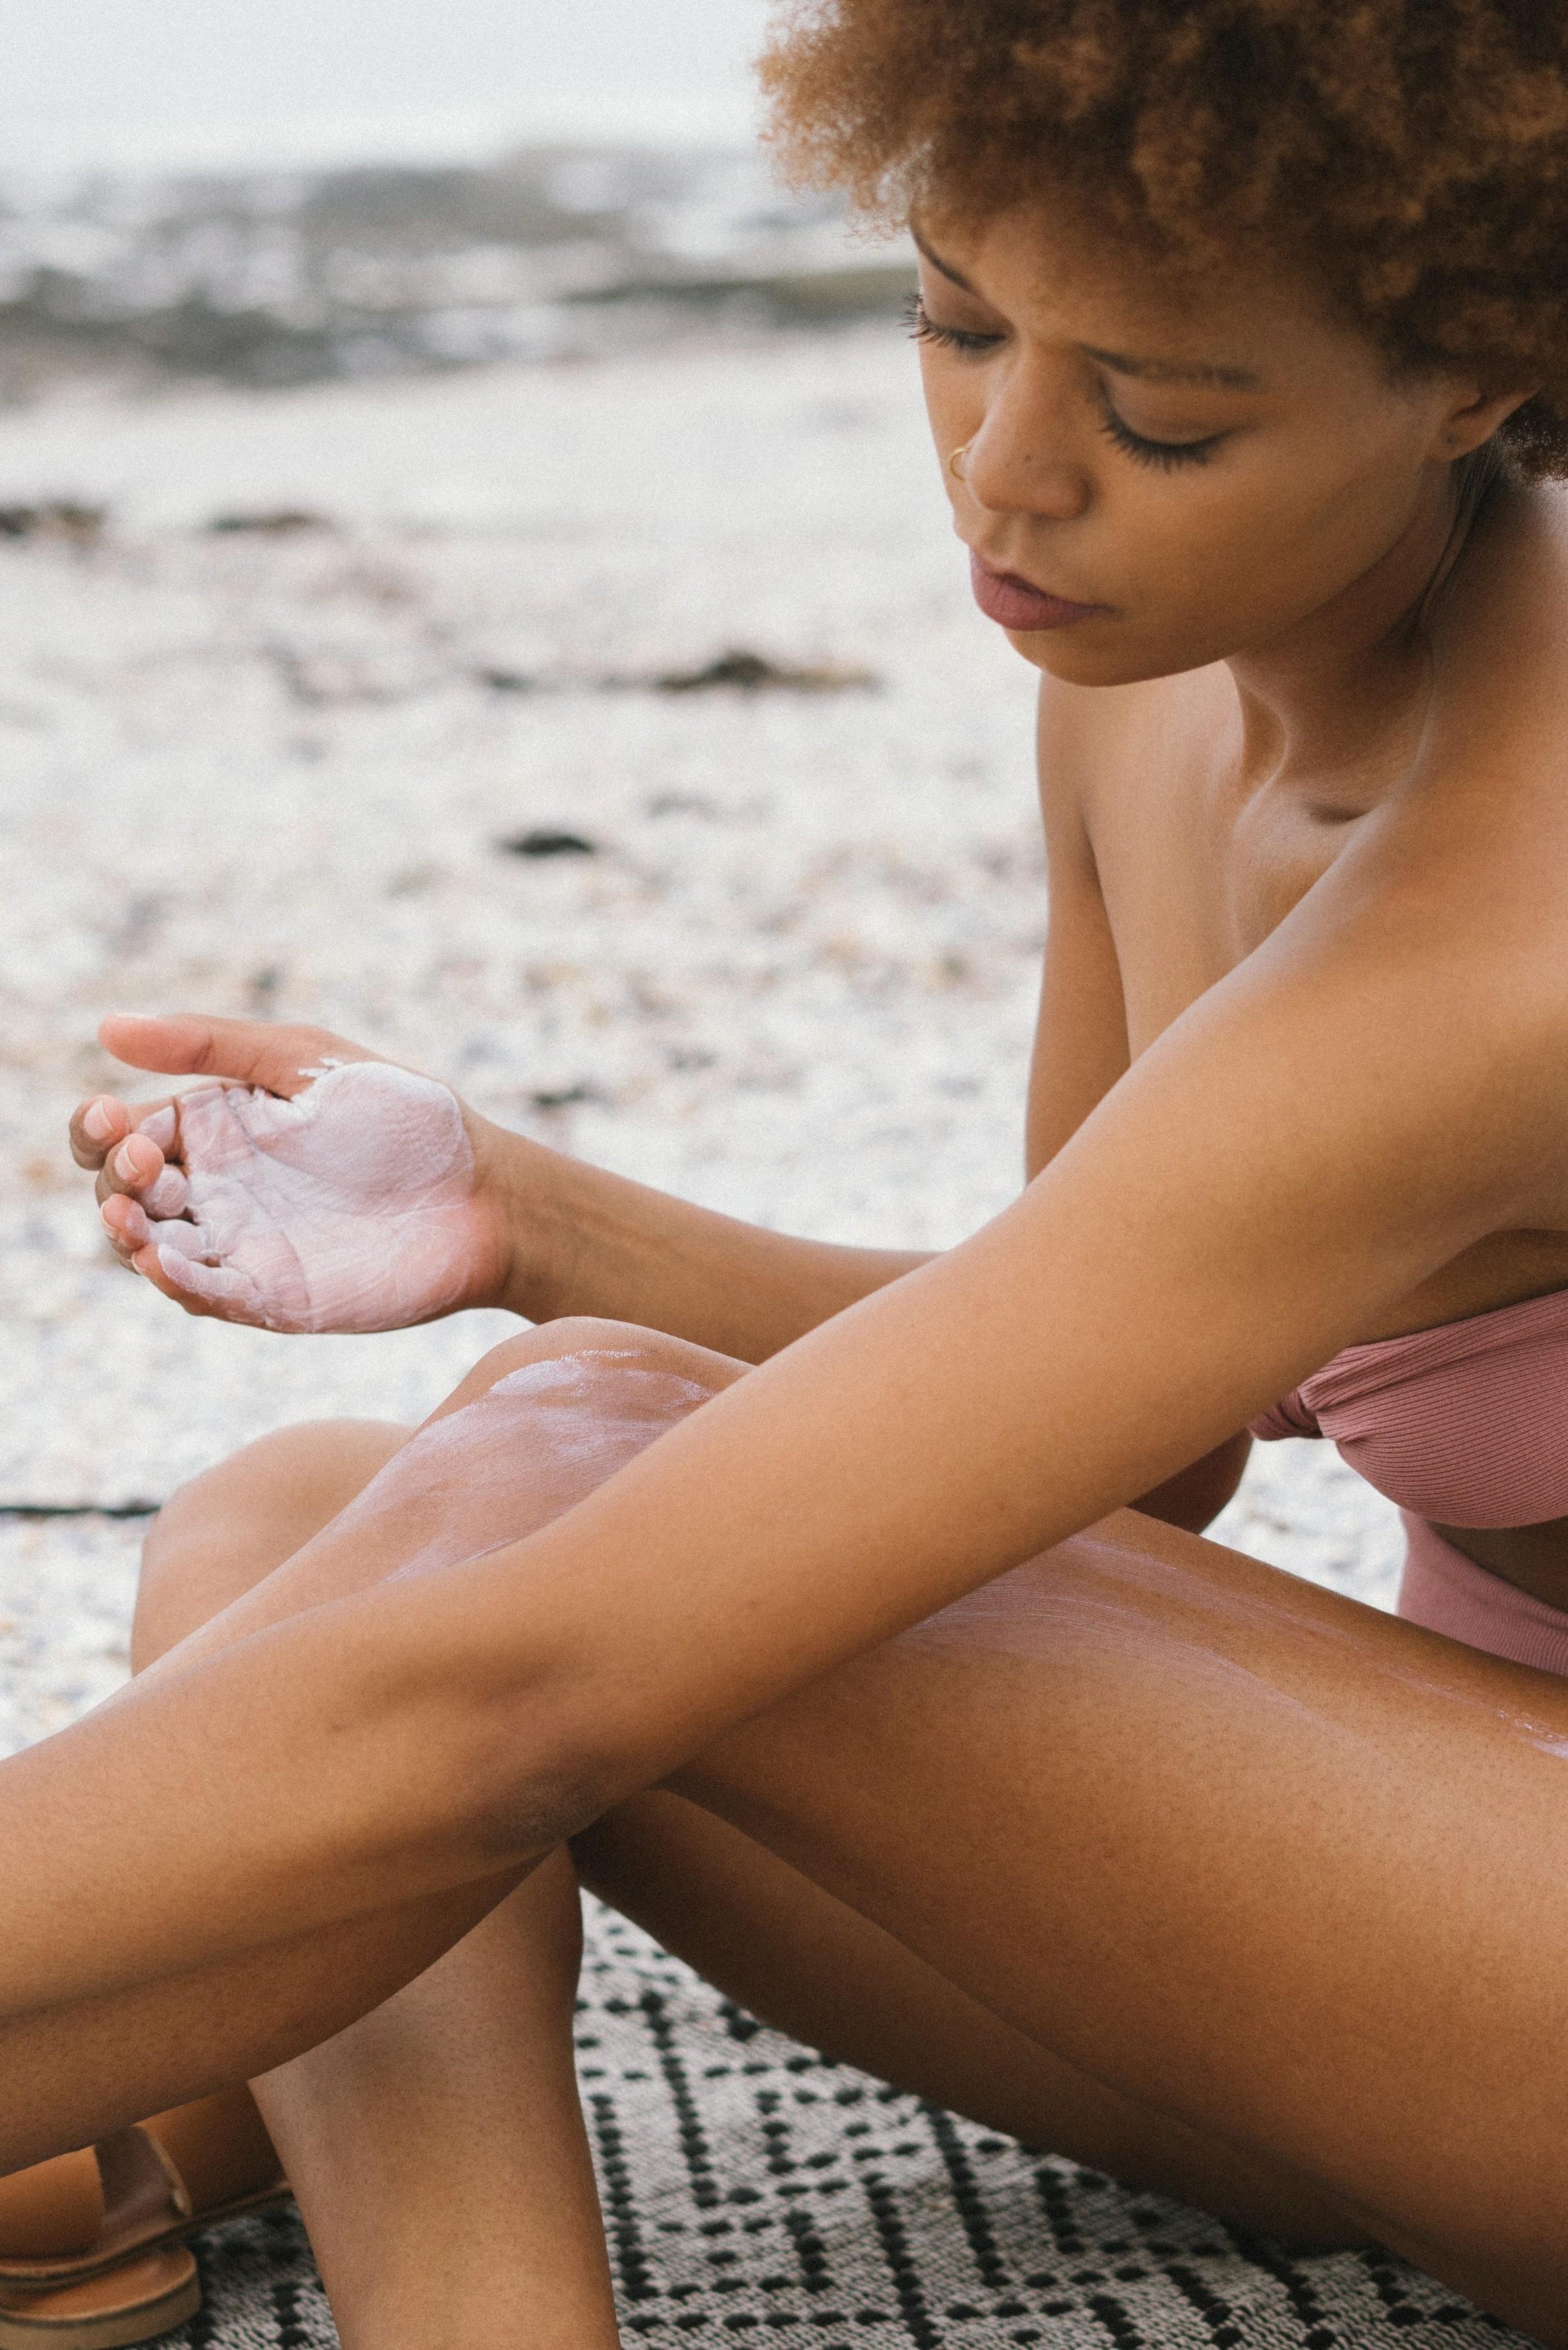 woman, wearing a pink bikini, applying sun protection during a heatwave